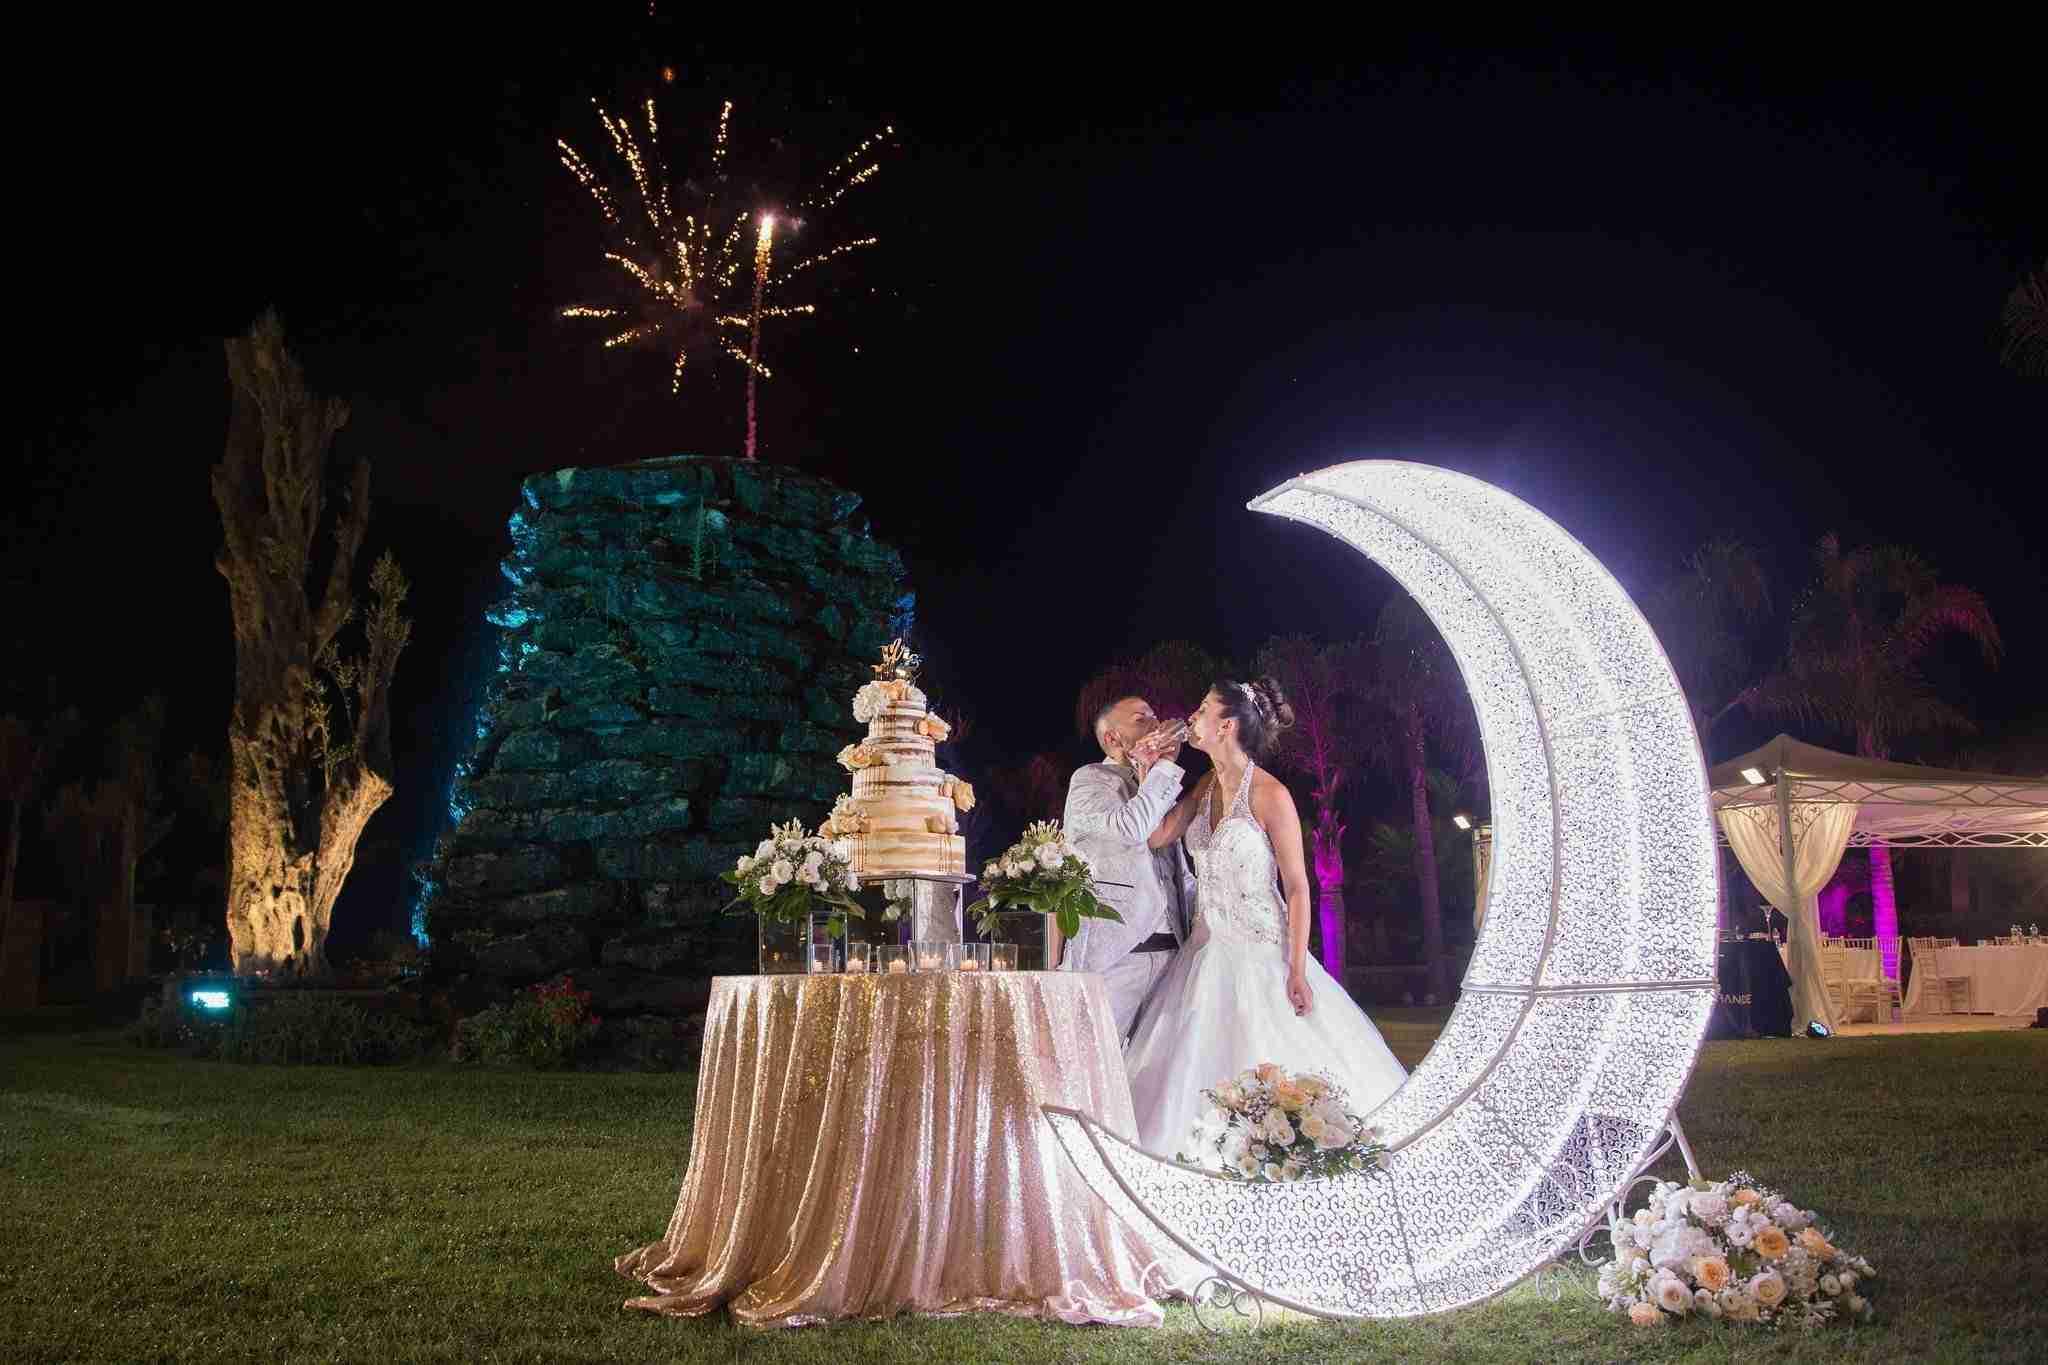 Matrimonio alla Villa dei Desideri